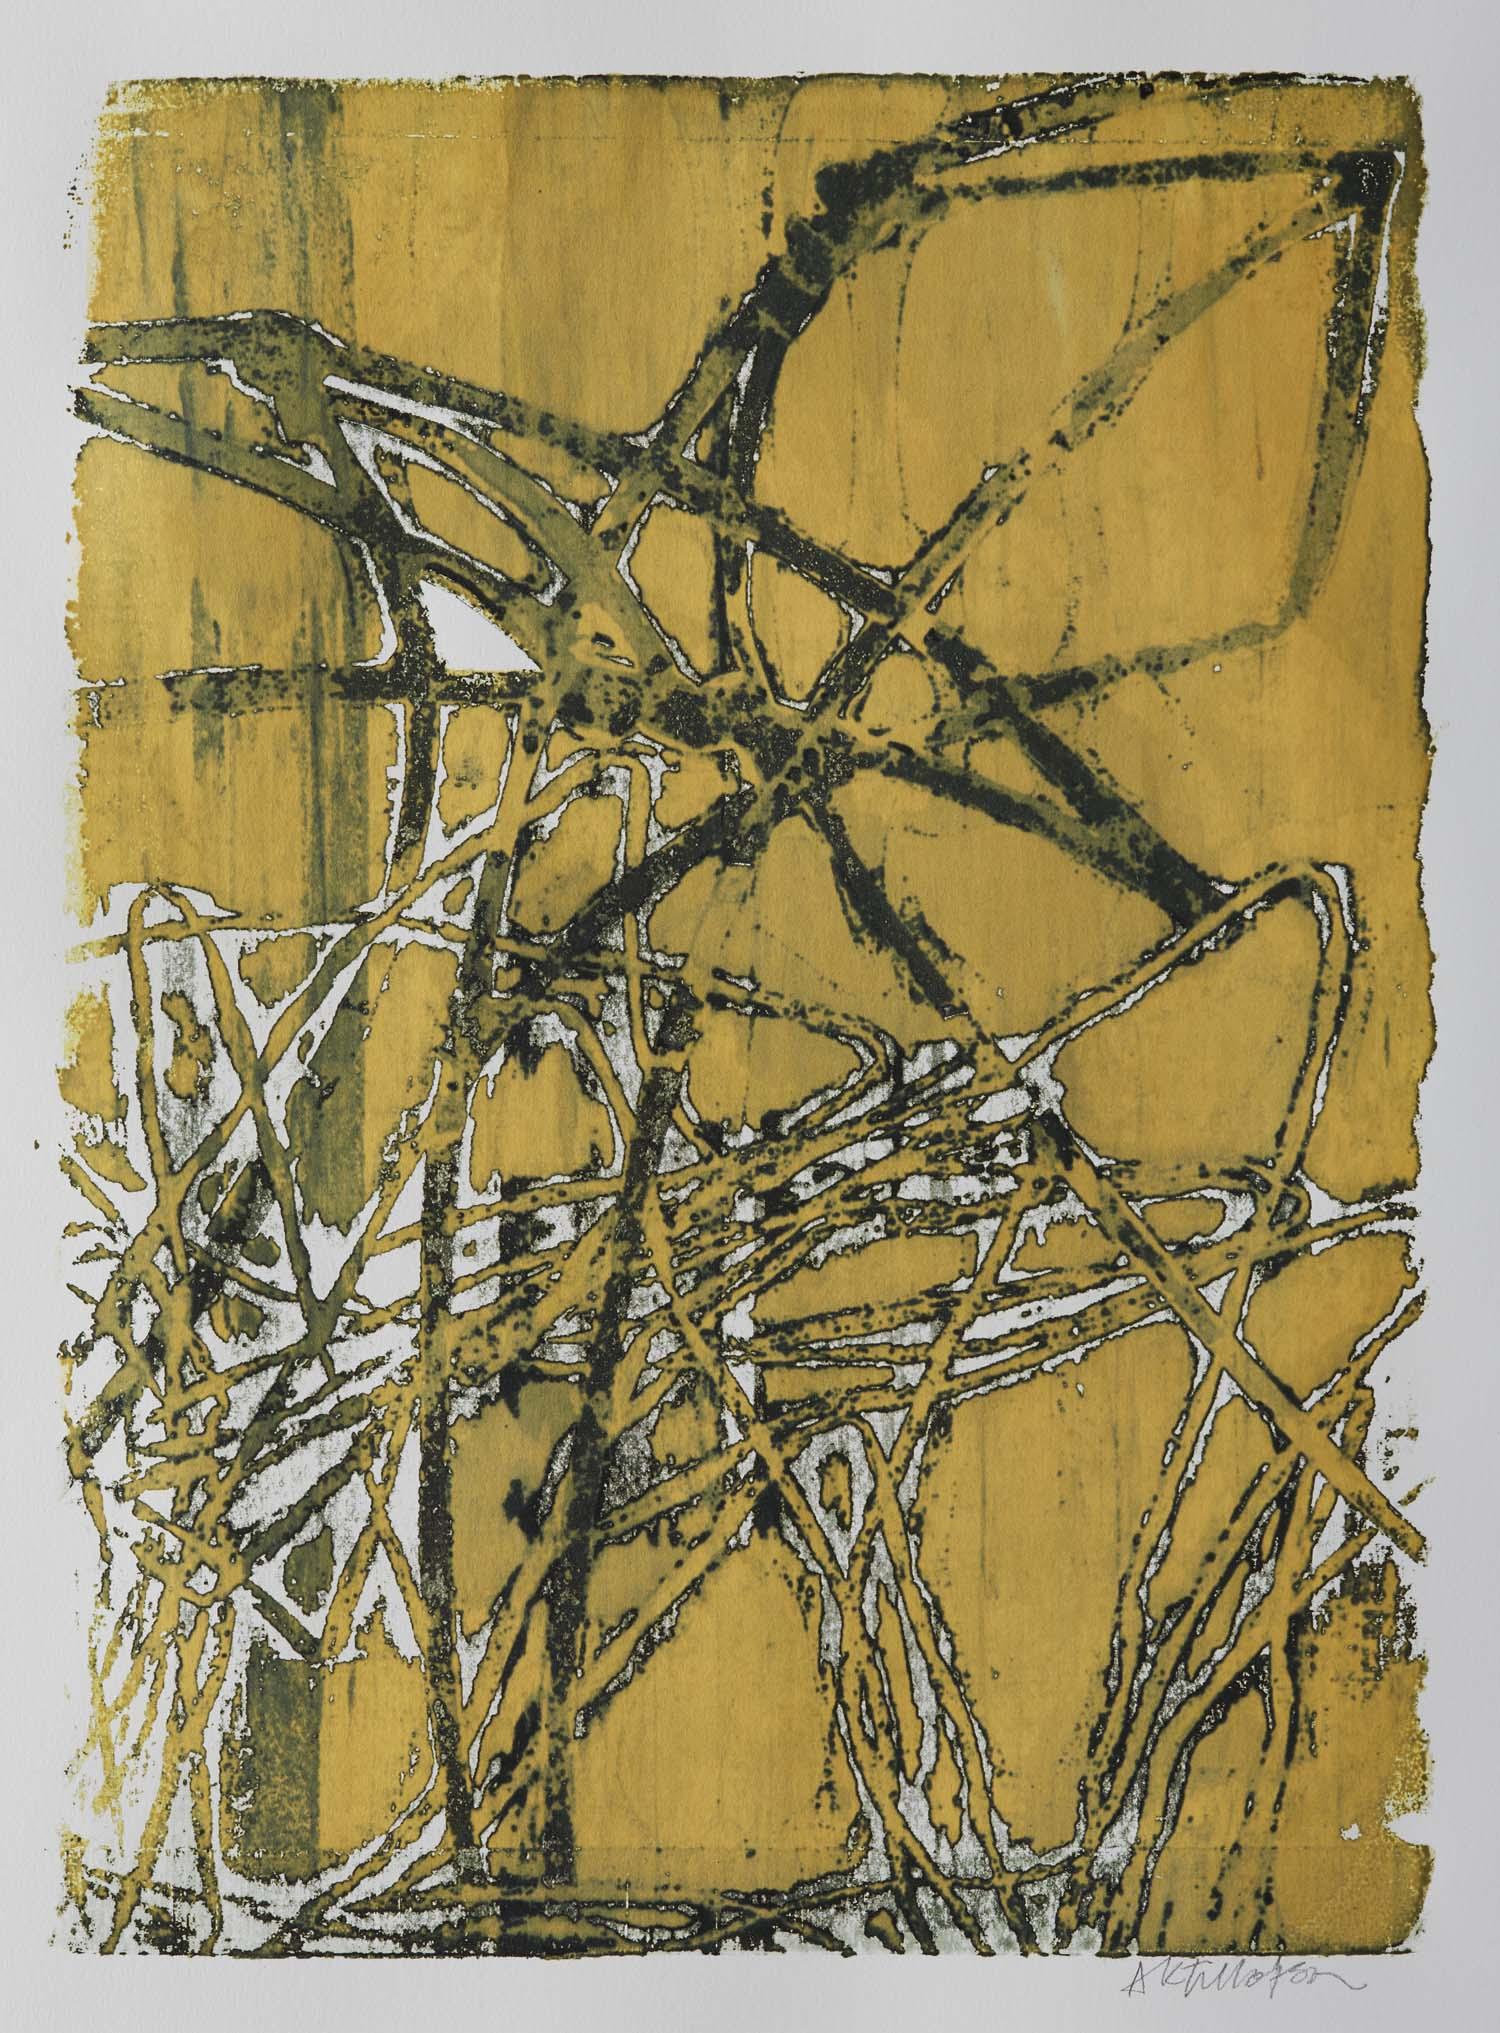 Finding My Way by St. Paul, MN multimedia artist, Amy Tillotson